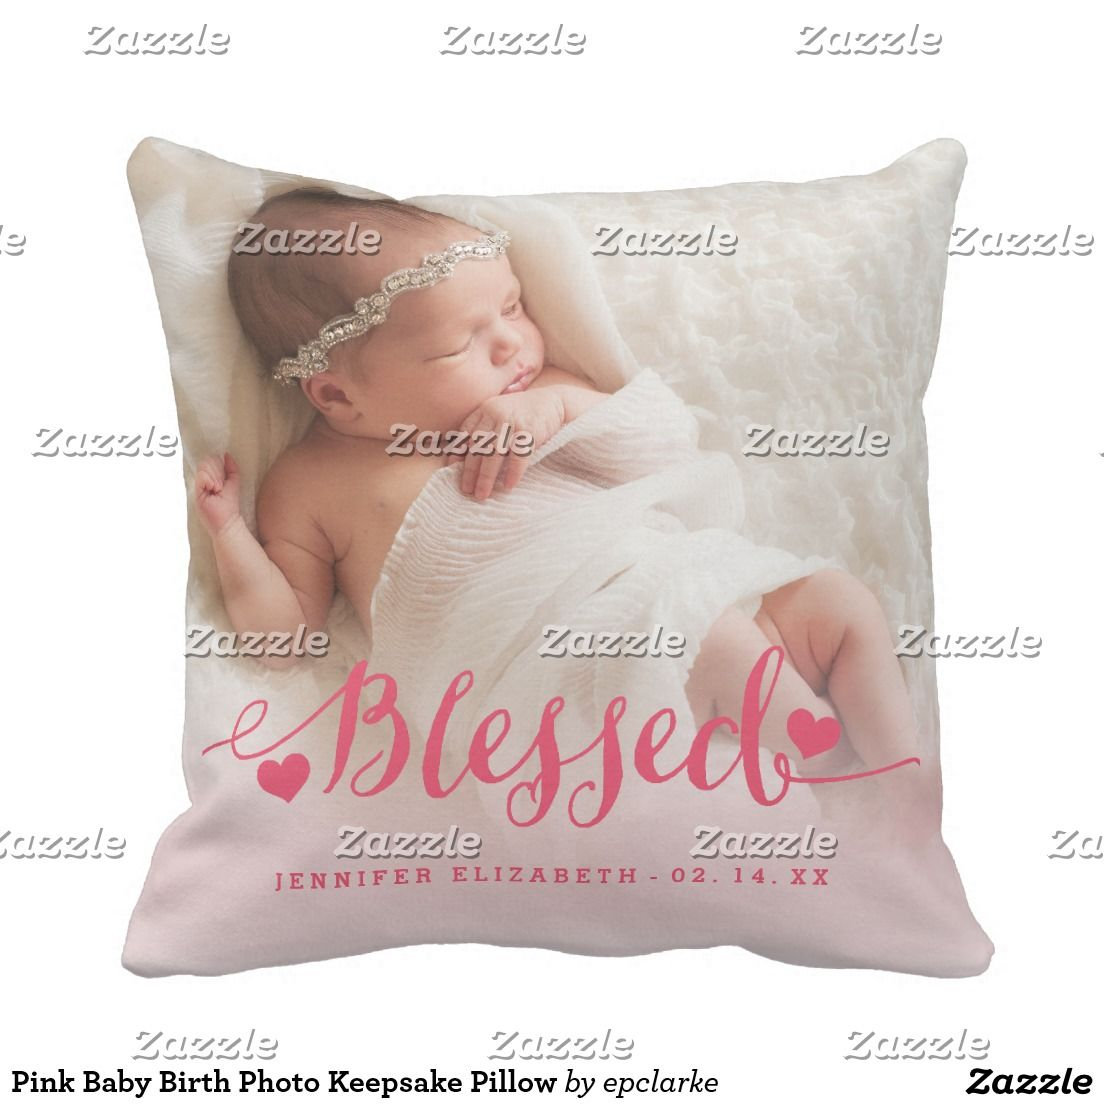 Pink Baby Birth Photo Keepsake Pillow. Inspiration to create your product. The photograph must have good resolution. Inspiración para crear tu producto. La fotografía debe tener buena resolución. Decoración para el hogar. Home decoration. #cojín #pillows